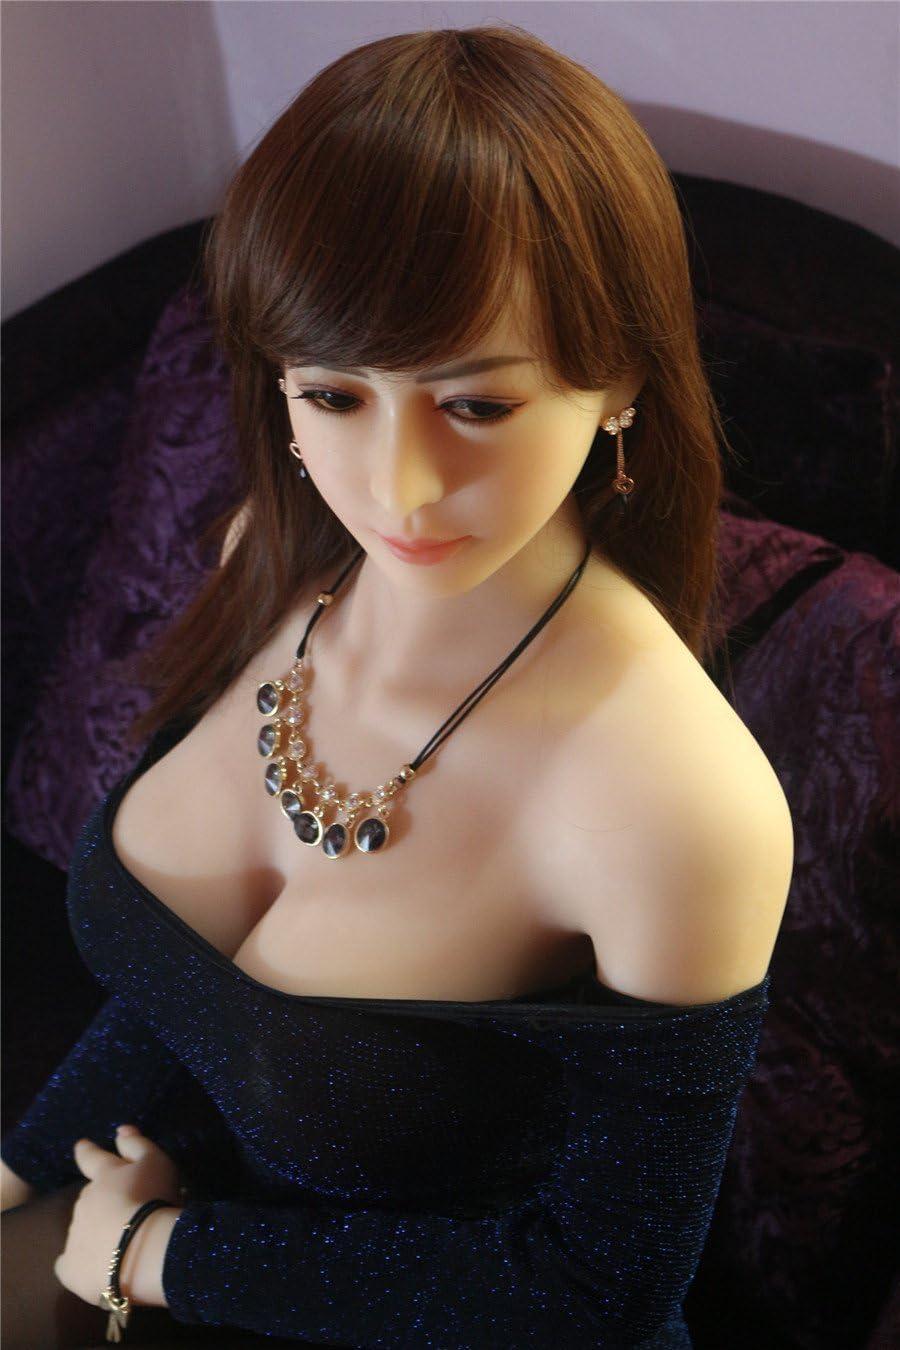 porno liseli